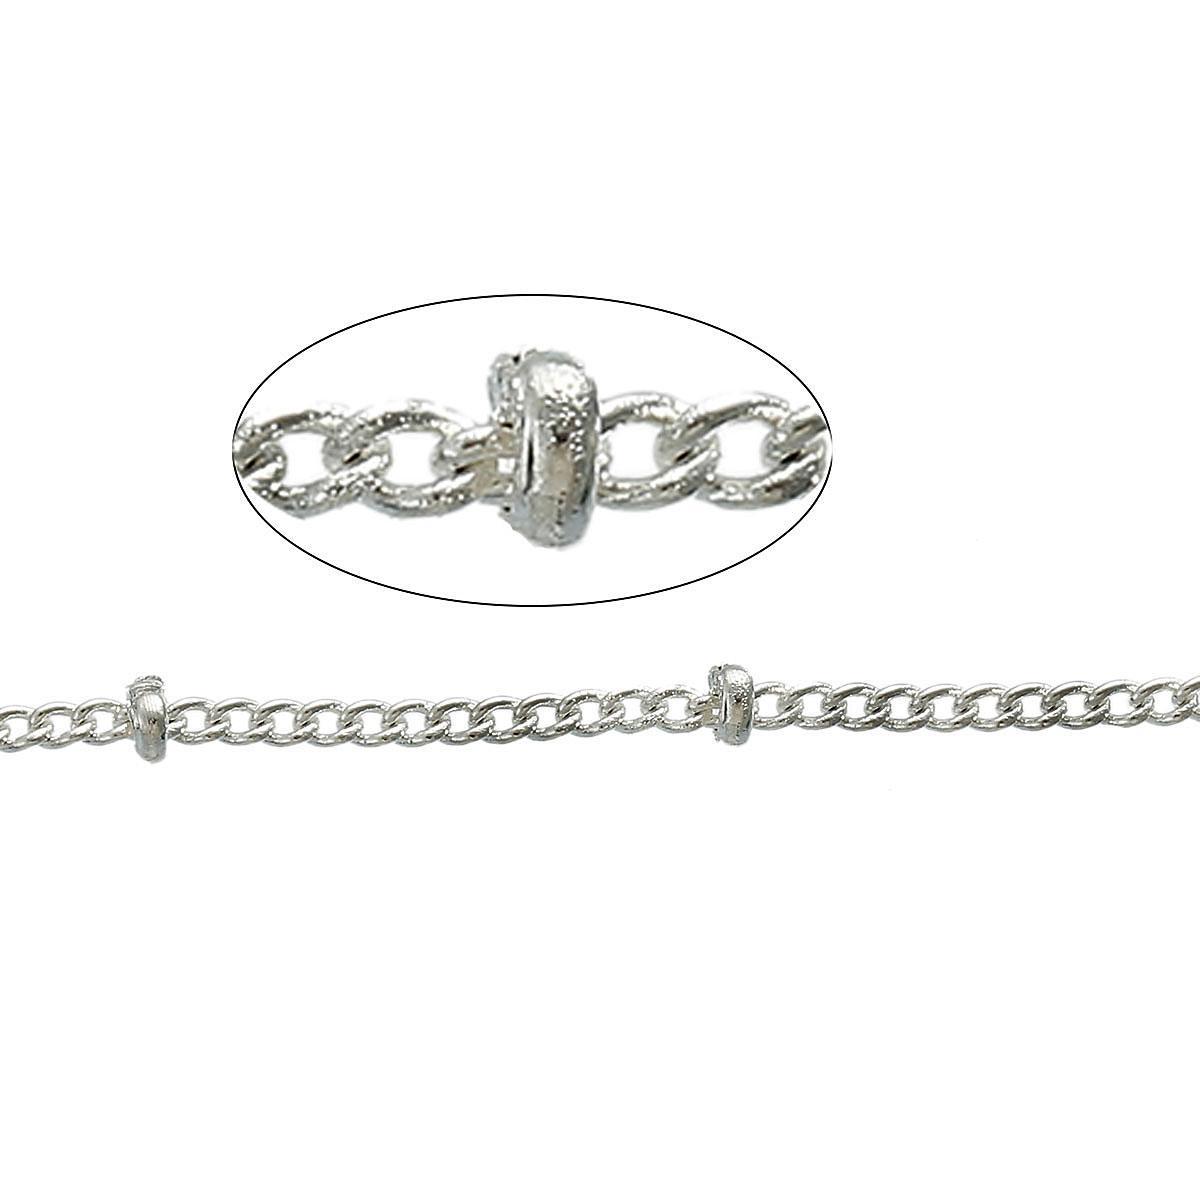 Цепочка на метраж, С Крепсами, Медь, Цвет: Серебро, 1.7 мм x 1.3 мм